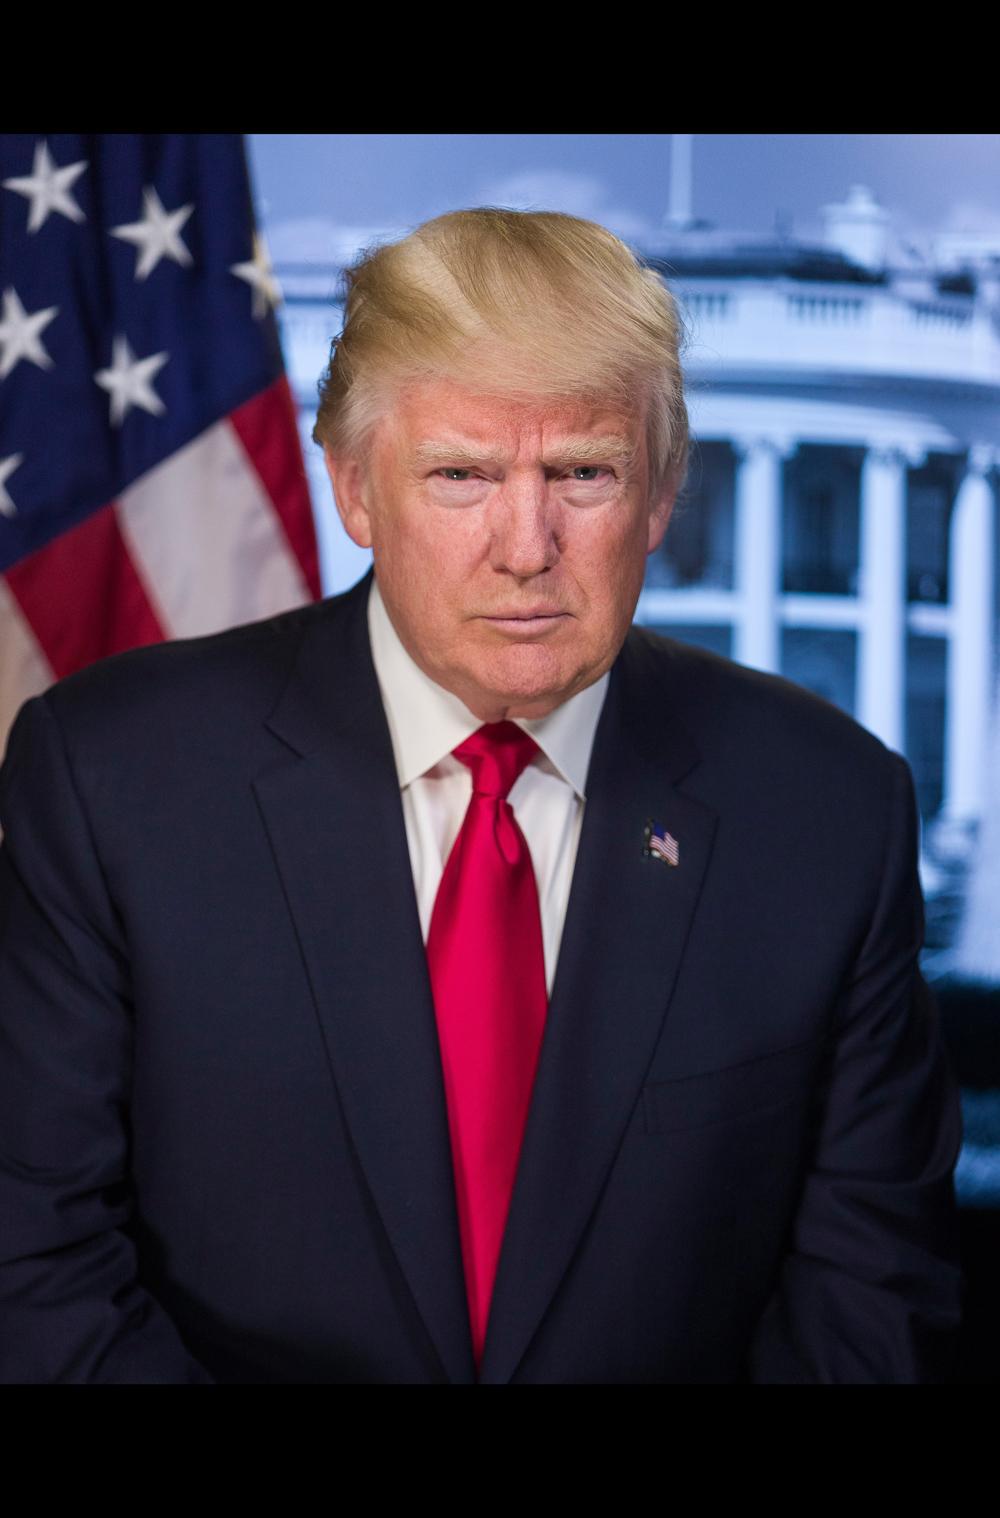 3020-Trump